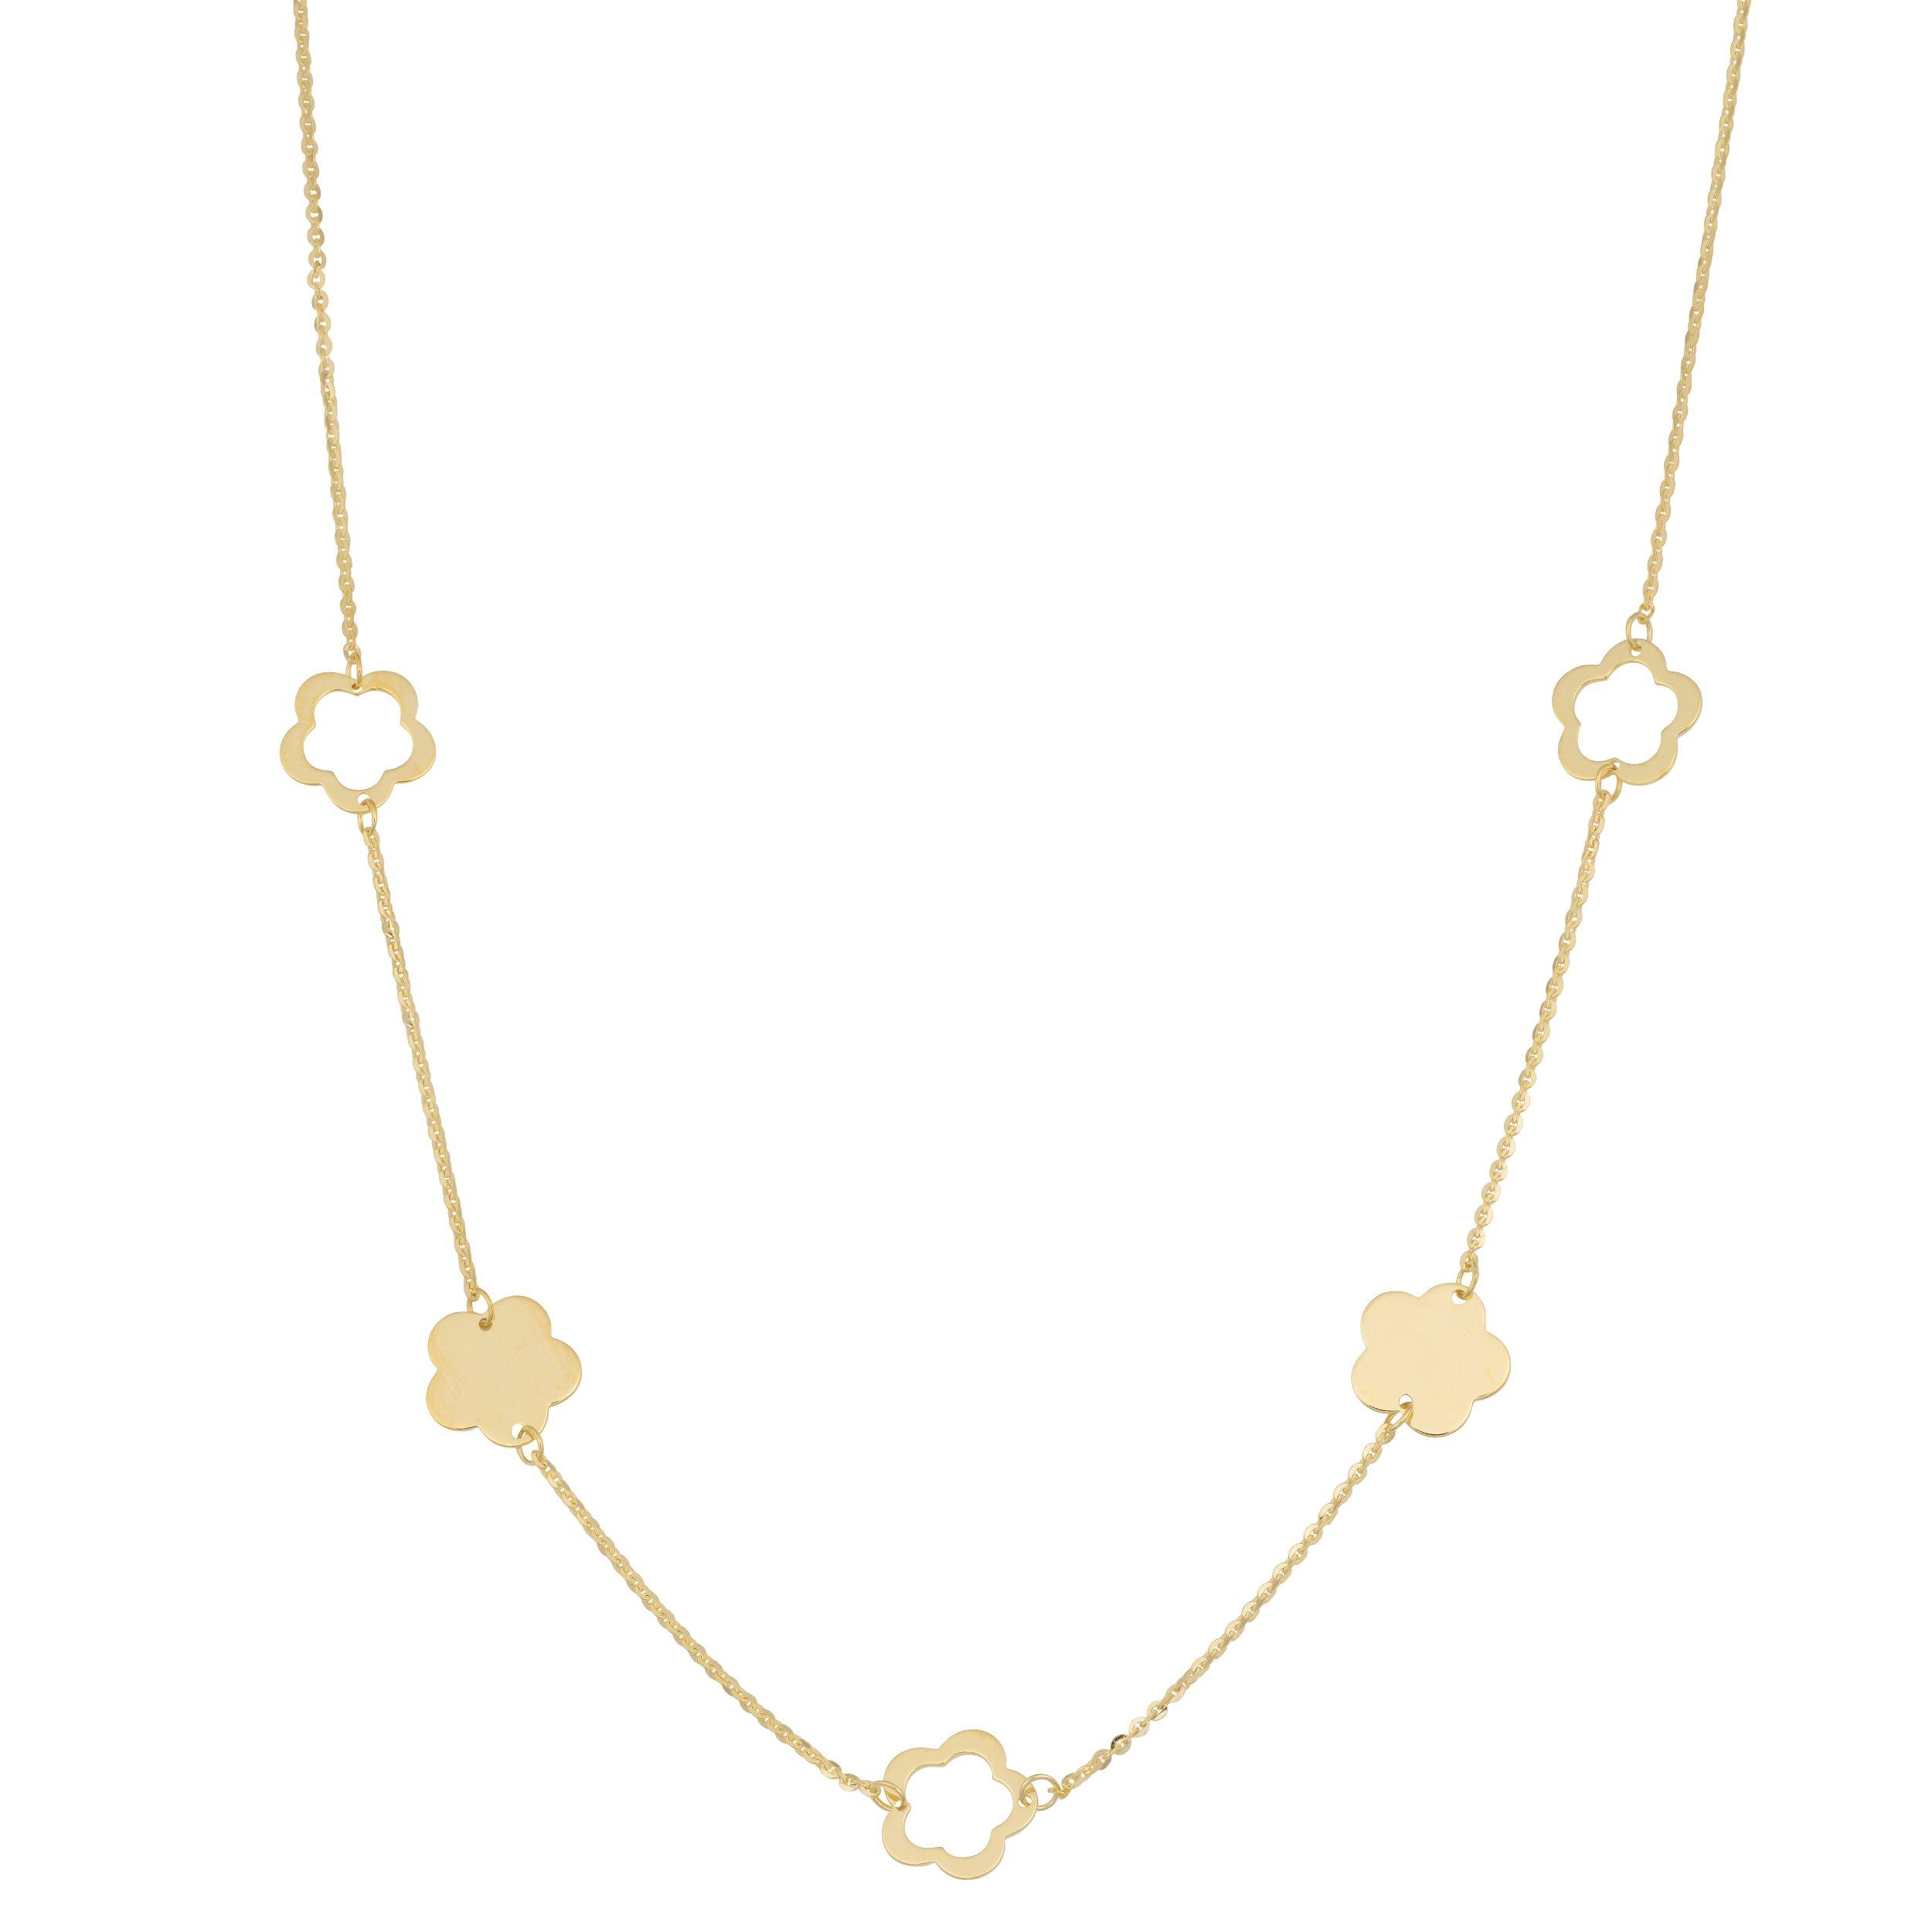 Kooljewelry 14k Yellow Gold Flower Station Necklace (18 inch) by Kooljewelry